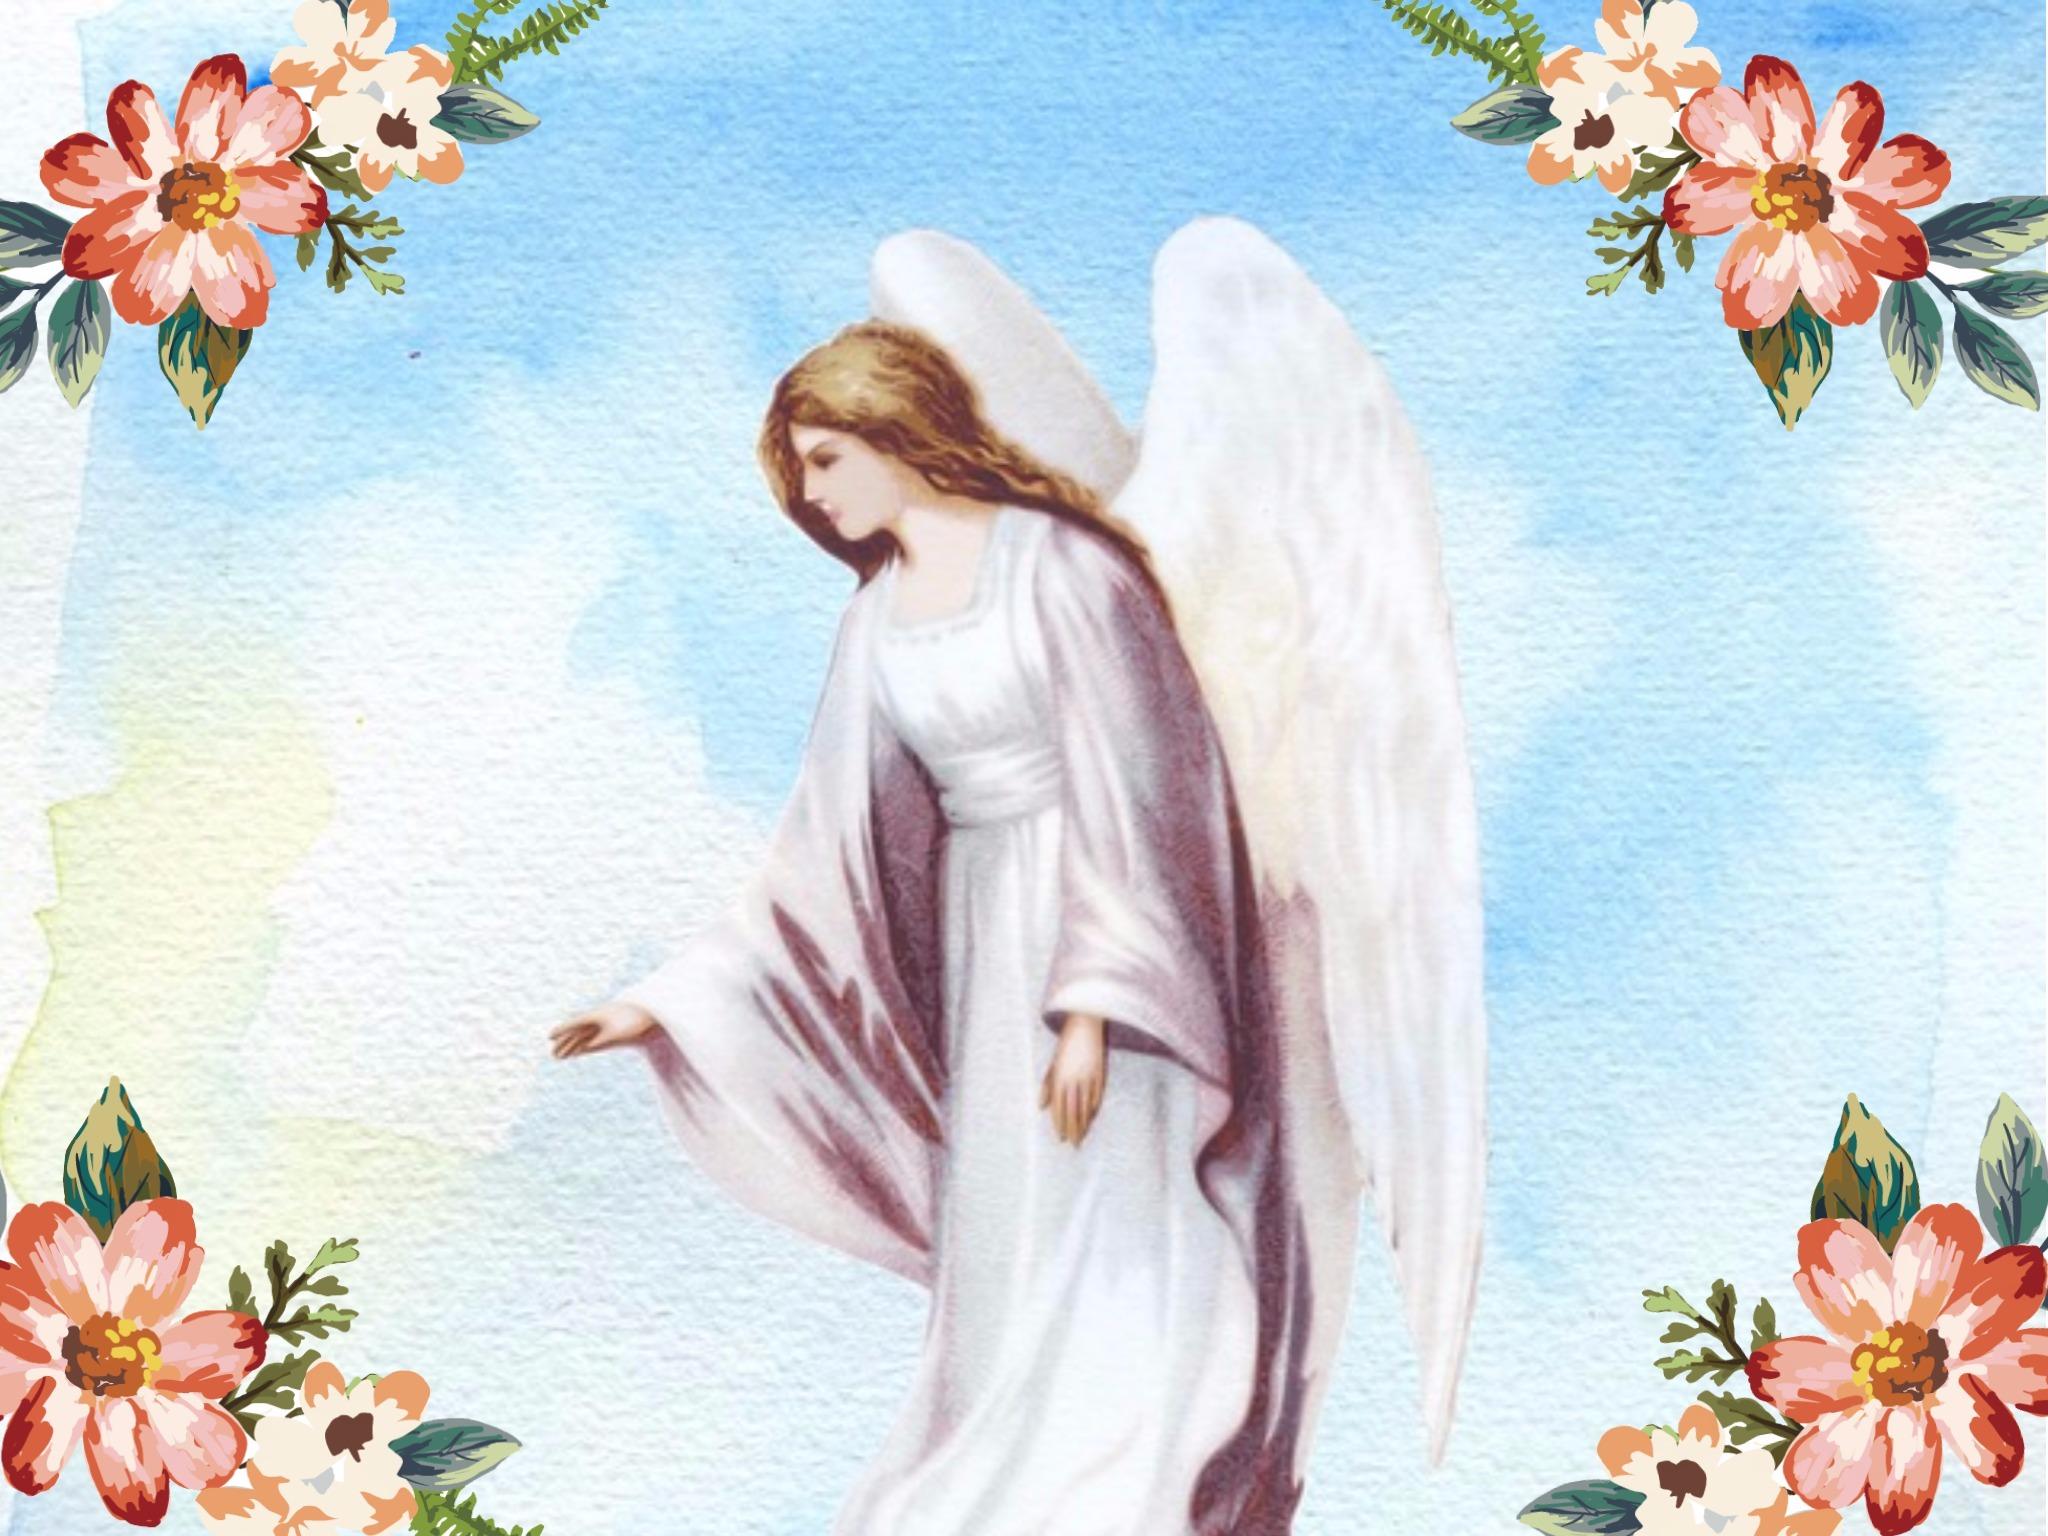 angel-01.jpg